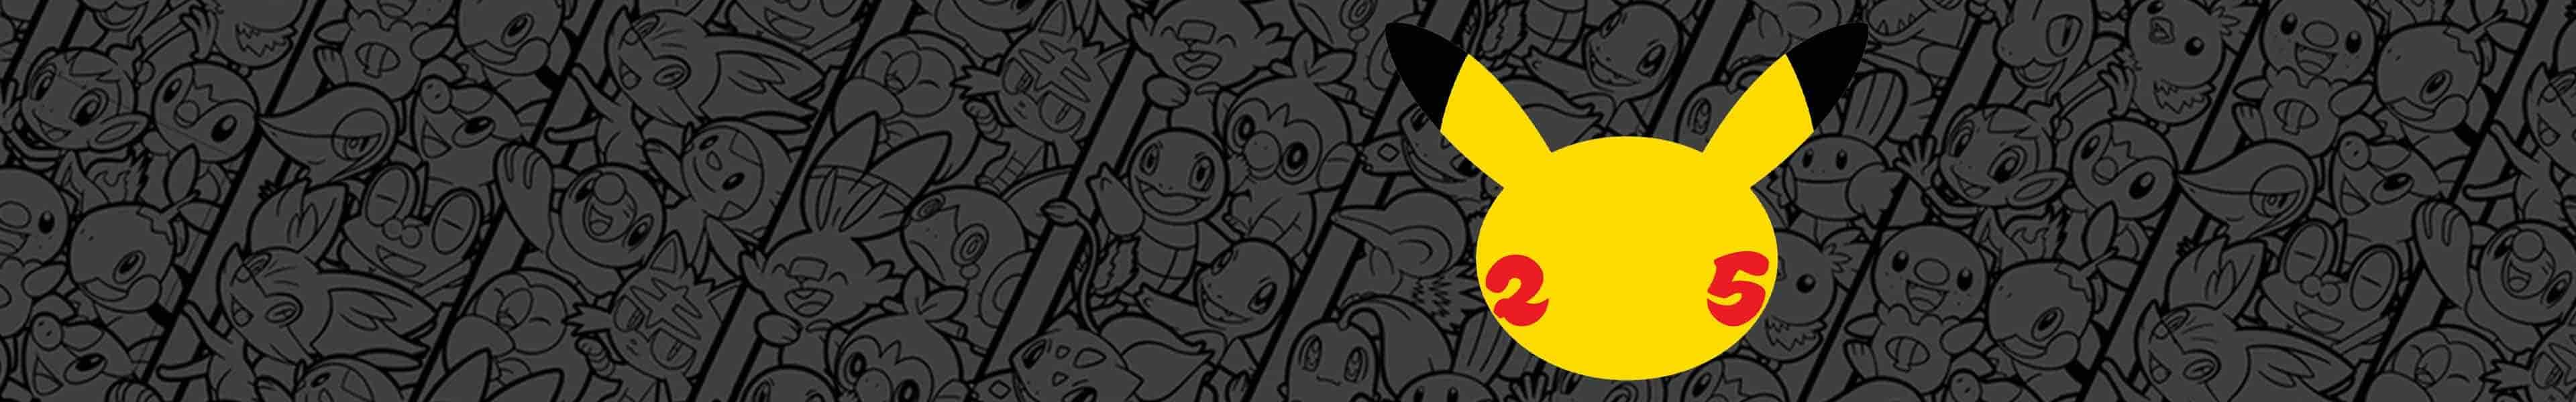 pokemon-celebrations.jpg